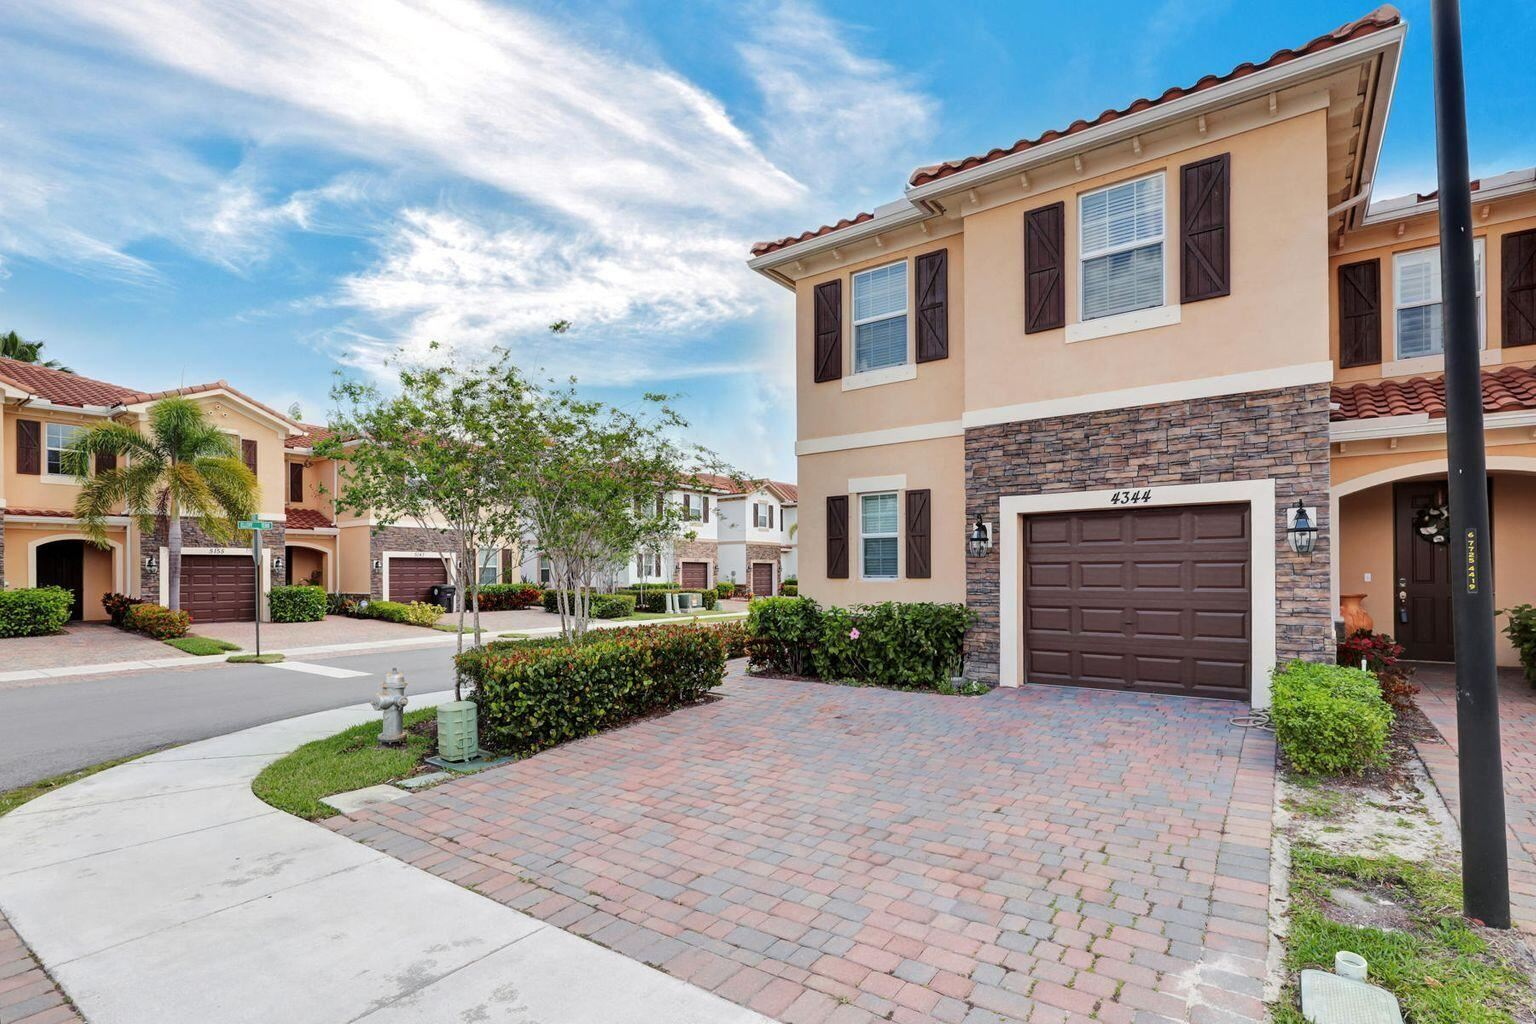 4344 Brewster Lane, West Palm Beach, FL 33417 - MLS#: RX-10721541